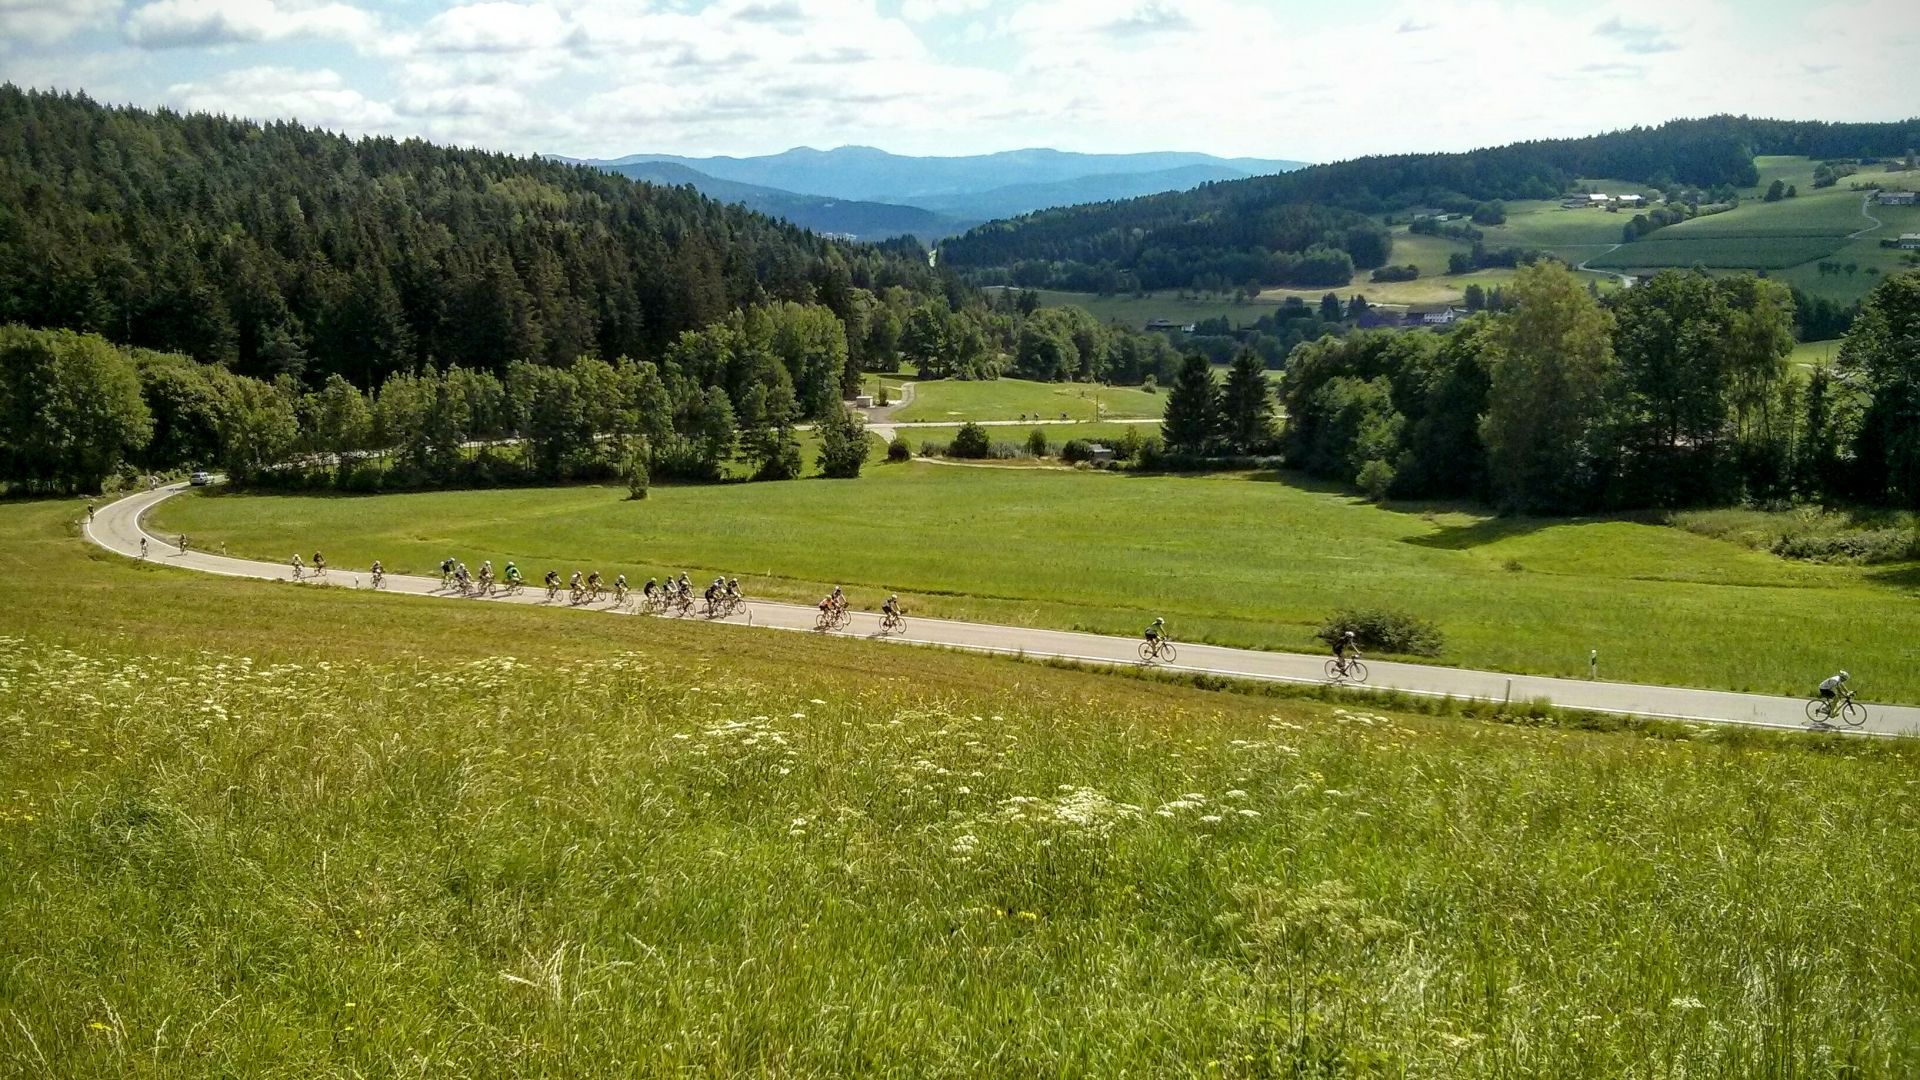 31. Arber-Radmarathon 2015